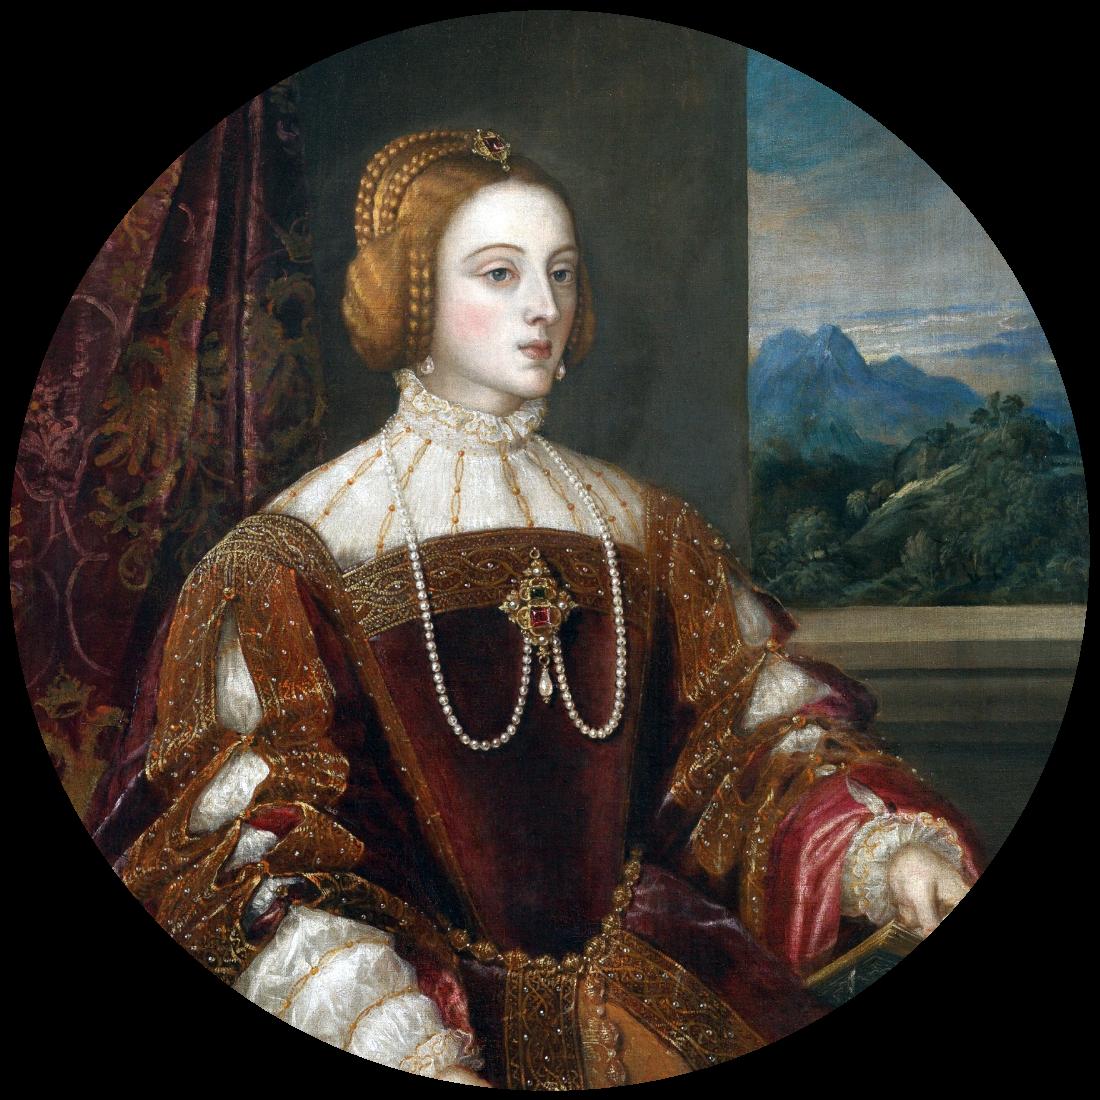 Portret van Isabella van Portugal door Titiaan (1548), Prado museum, Madrid, Spanje